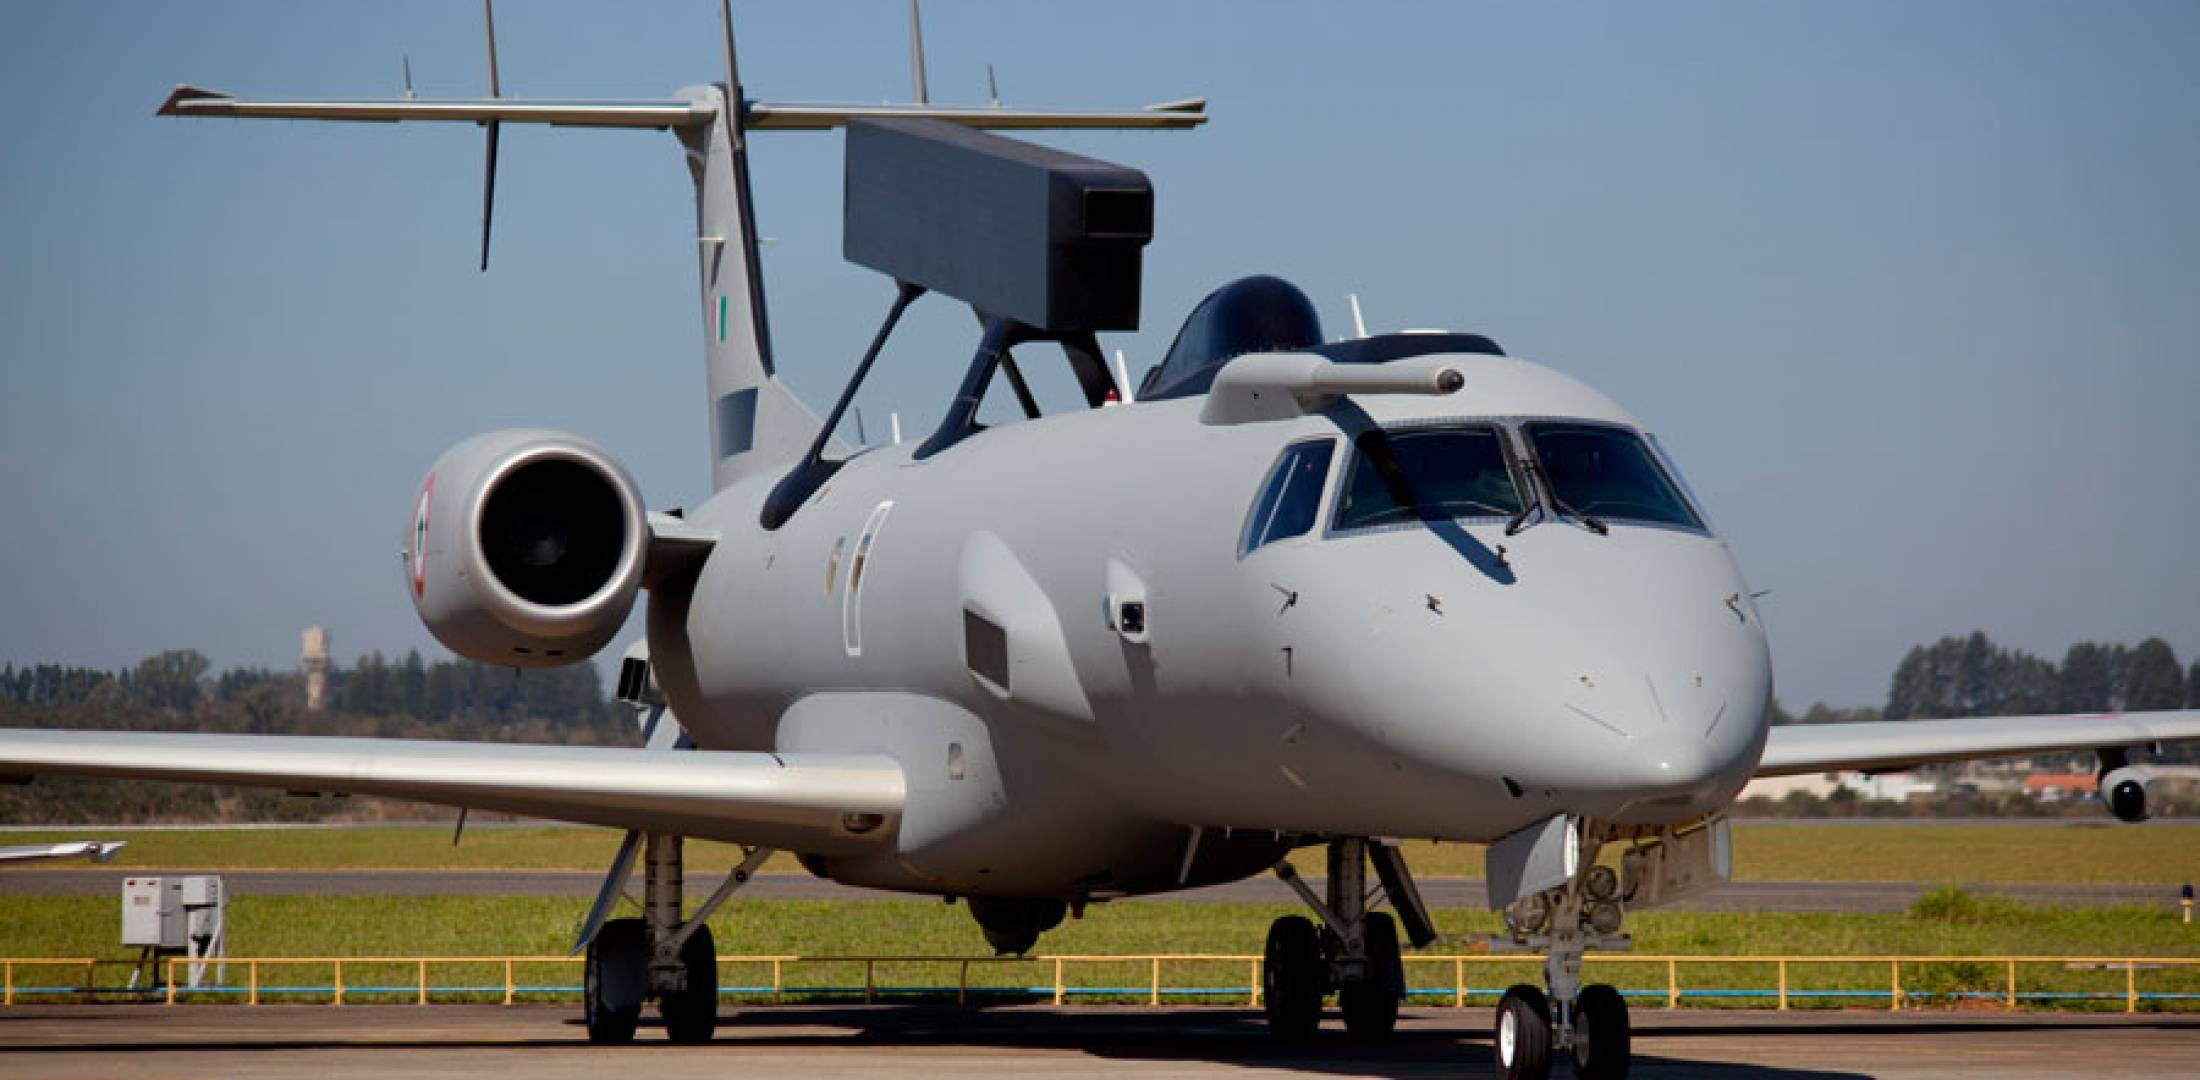 emb-aewc de la fuerza aerea india